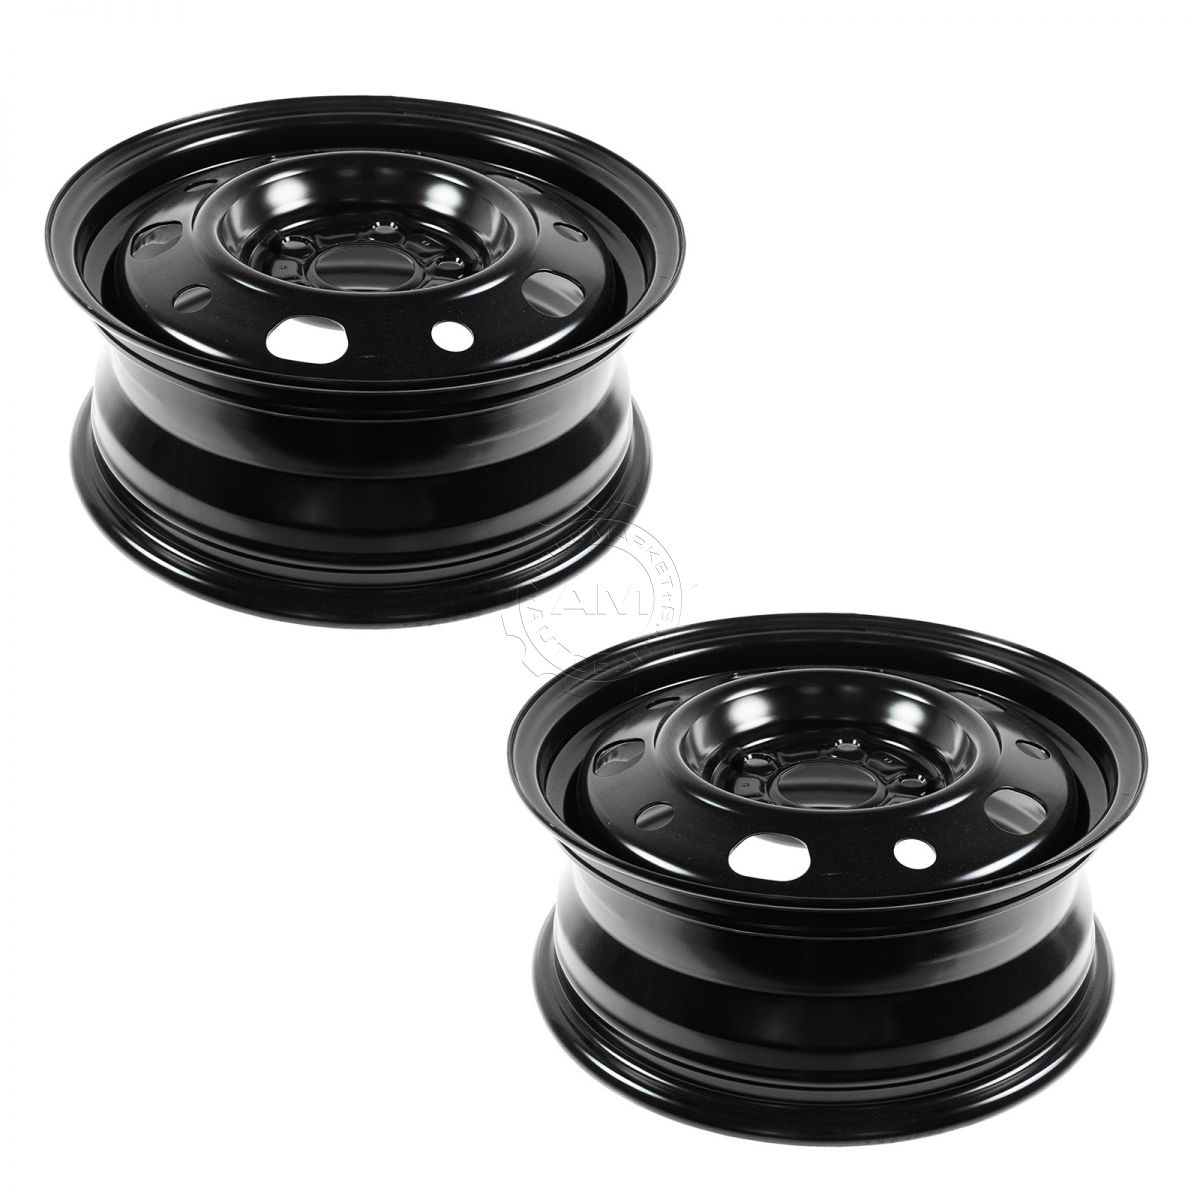 Dorman 15 inch Steel Replacement Wheel Rim New SET of 4 for 07-12 Dodge Caliber